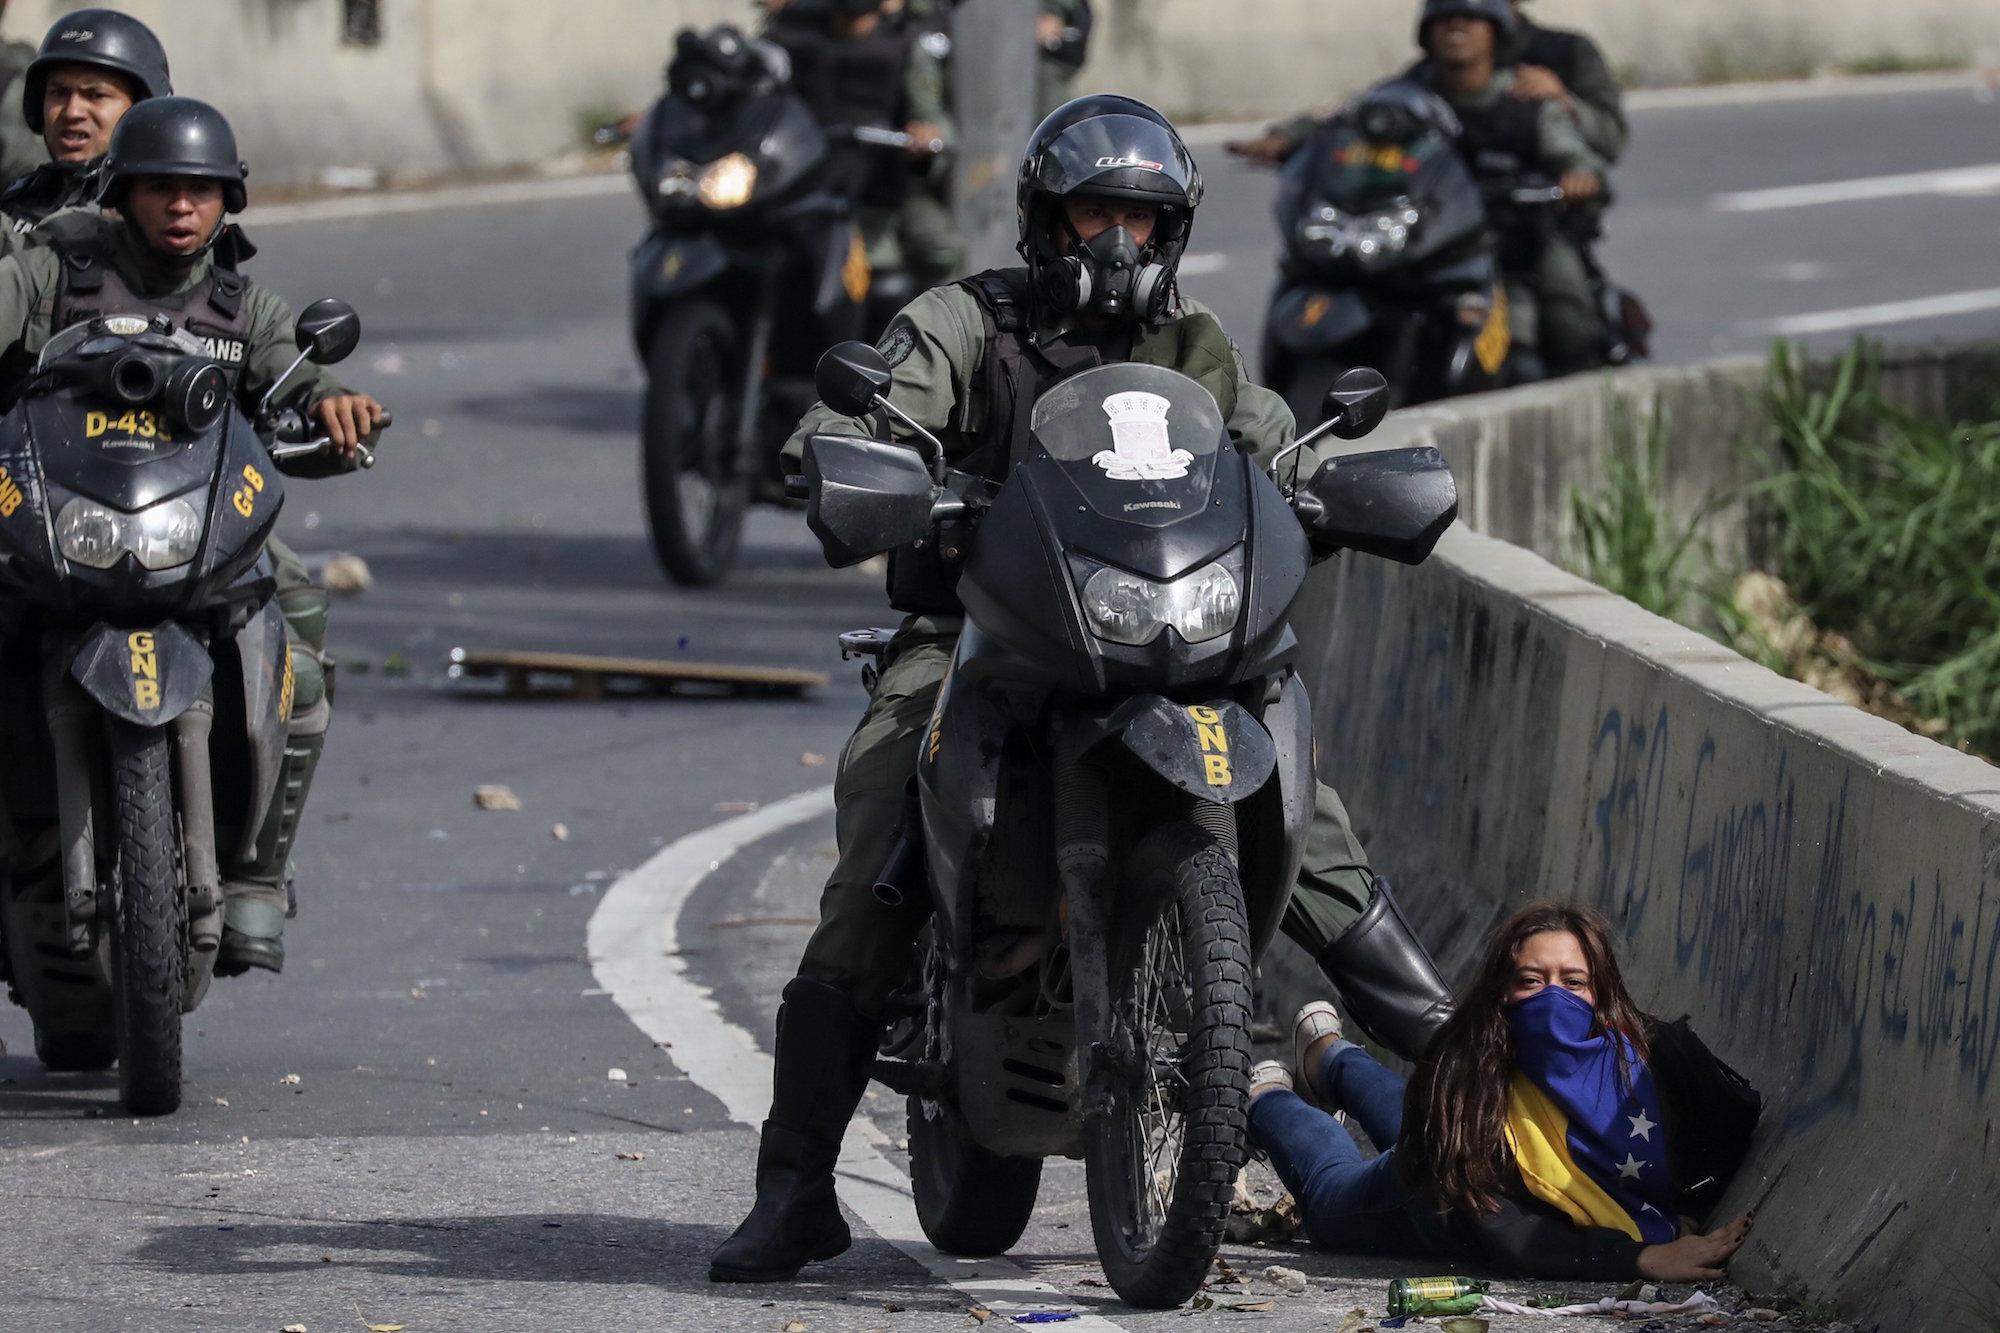 DDHH olvidados | Detenida, torturada y pisada por la bota militar